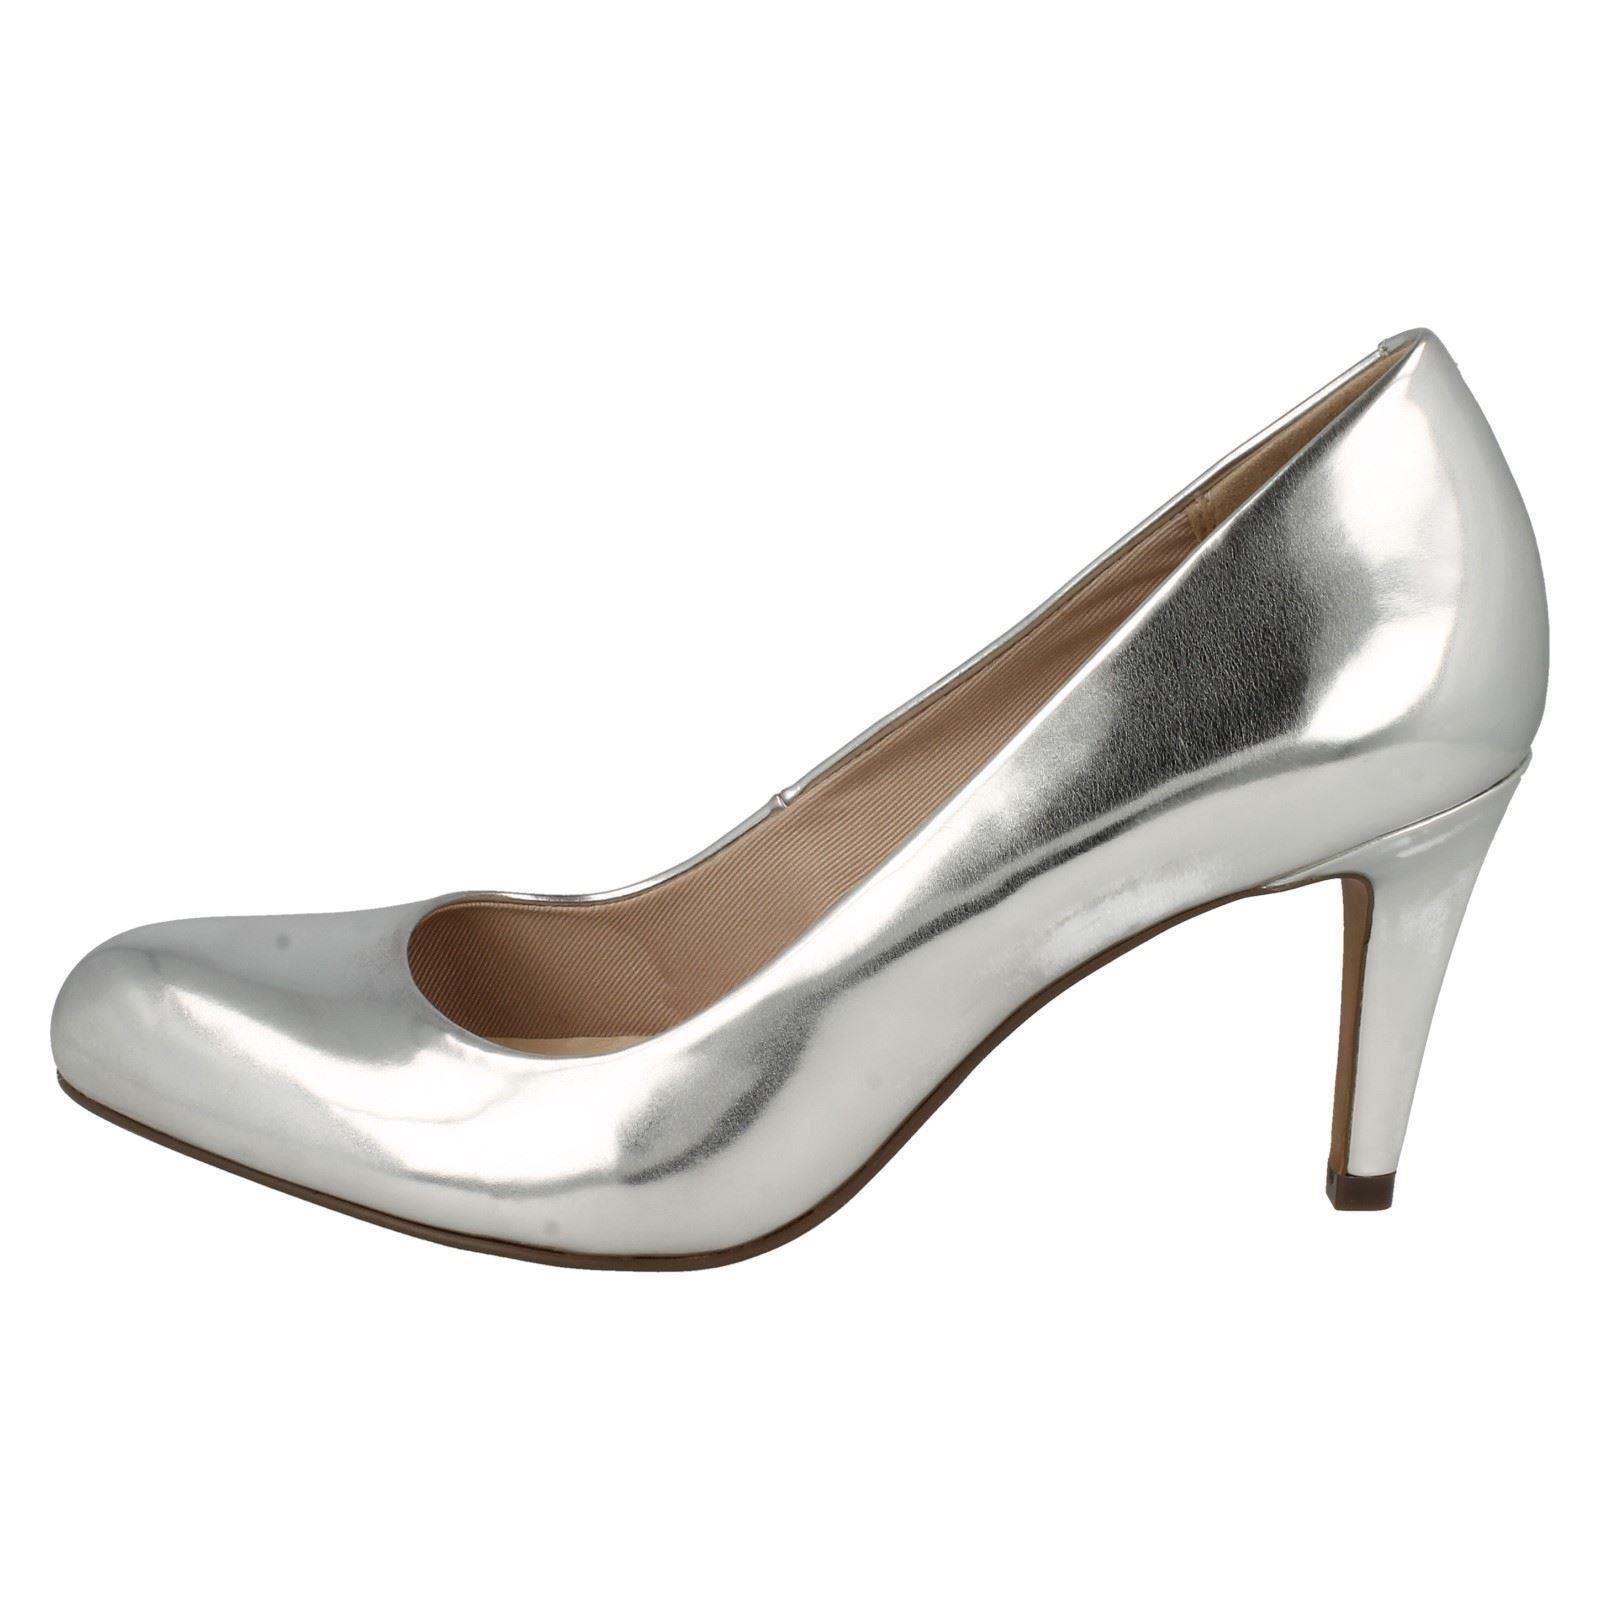 Ladies Clarks Court Shoes 039 Carlita Cove 039